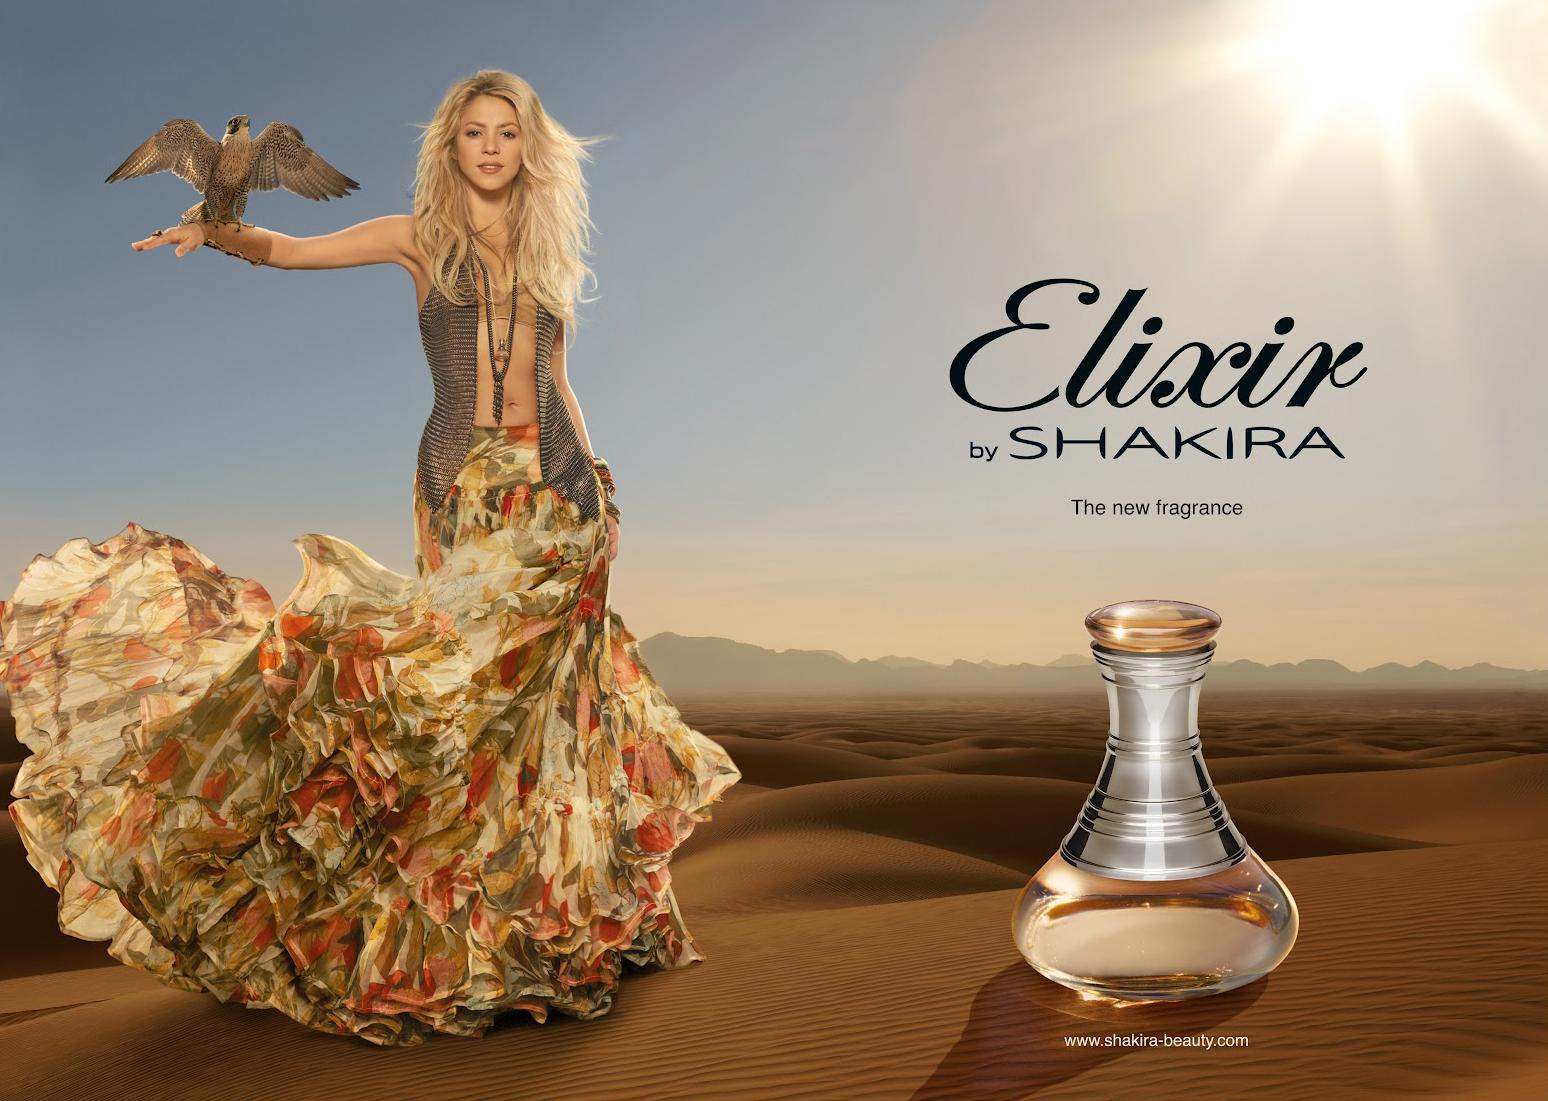 http://1.bp.blogspot.com/-7UZcRs8sH2g/UIVeEMabDiI/AAAAAAAACP0/4bGZ73vrnSI/s1600/Elixir_by_Shakira+(1).jpg